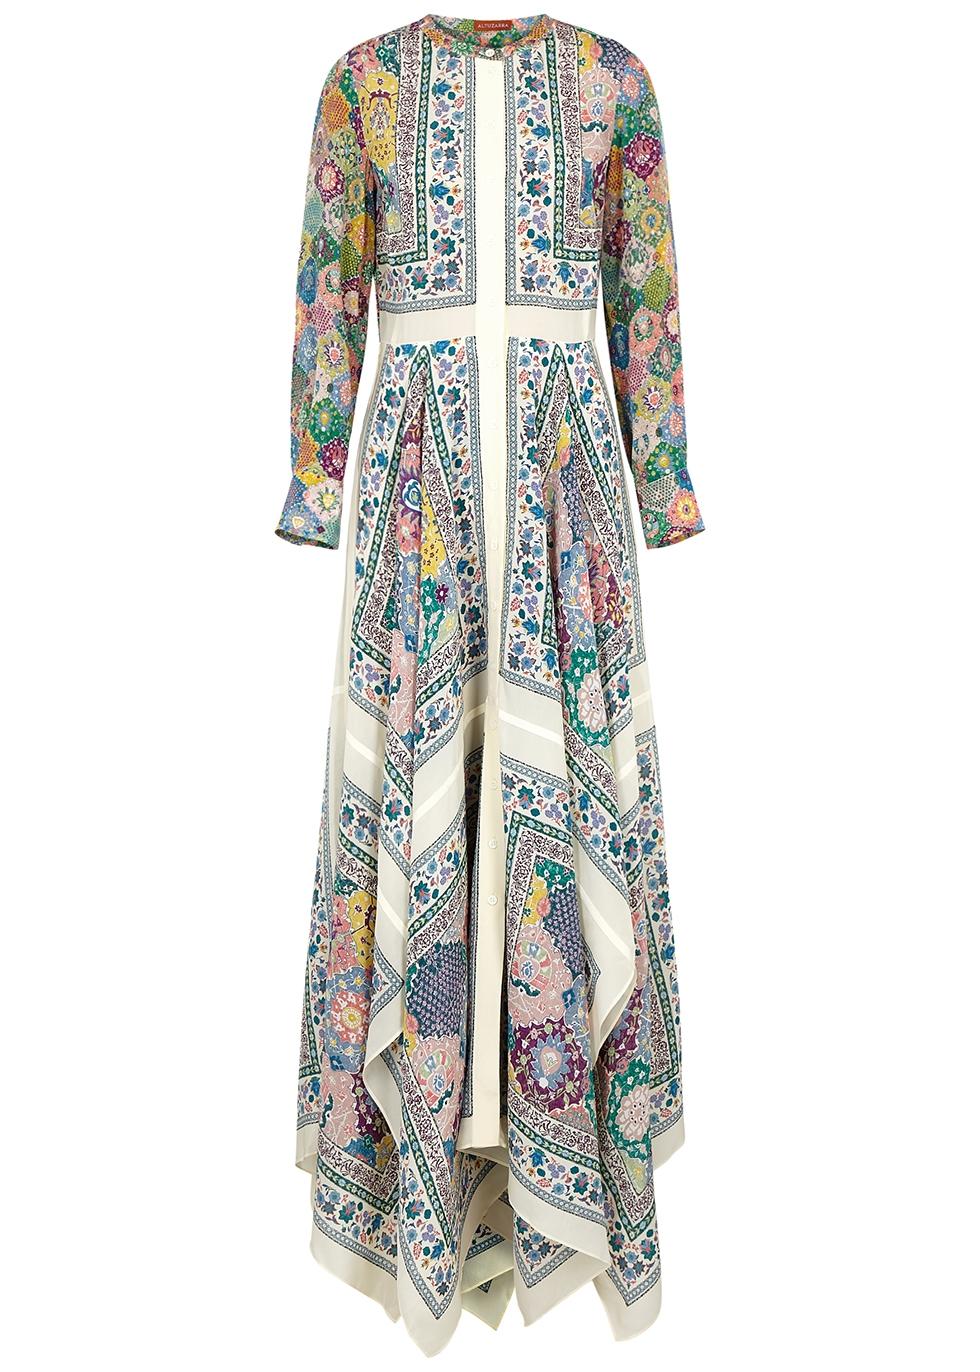 f4c1ff68e382 New In - Women's Designer Clothing - Harvey Nichols